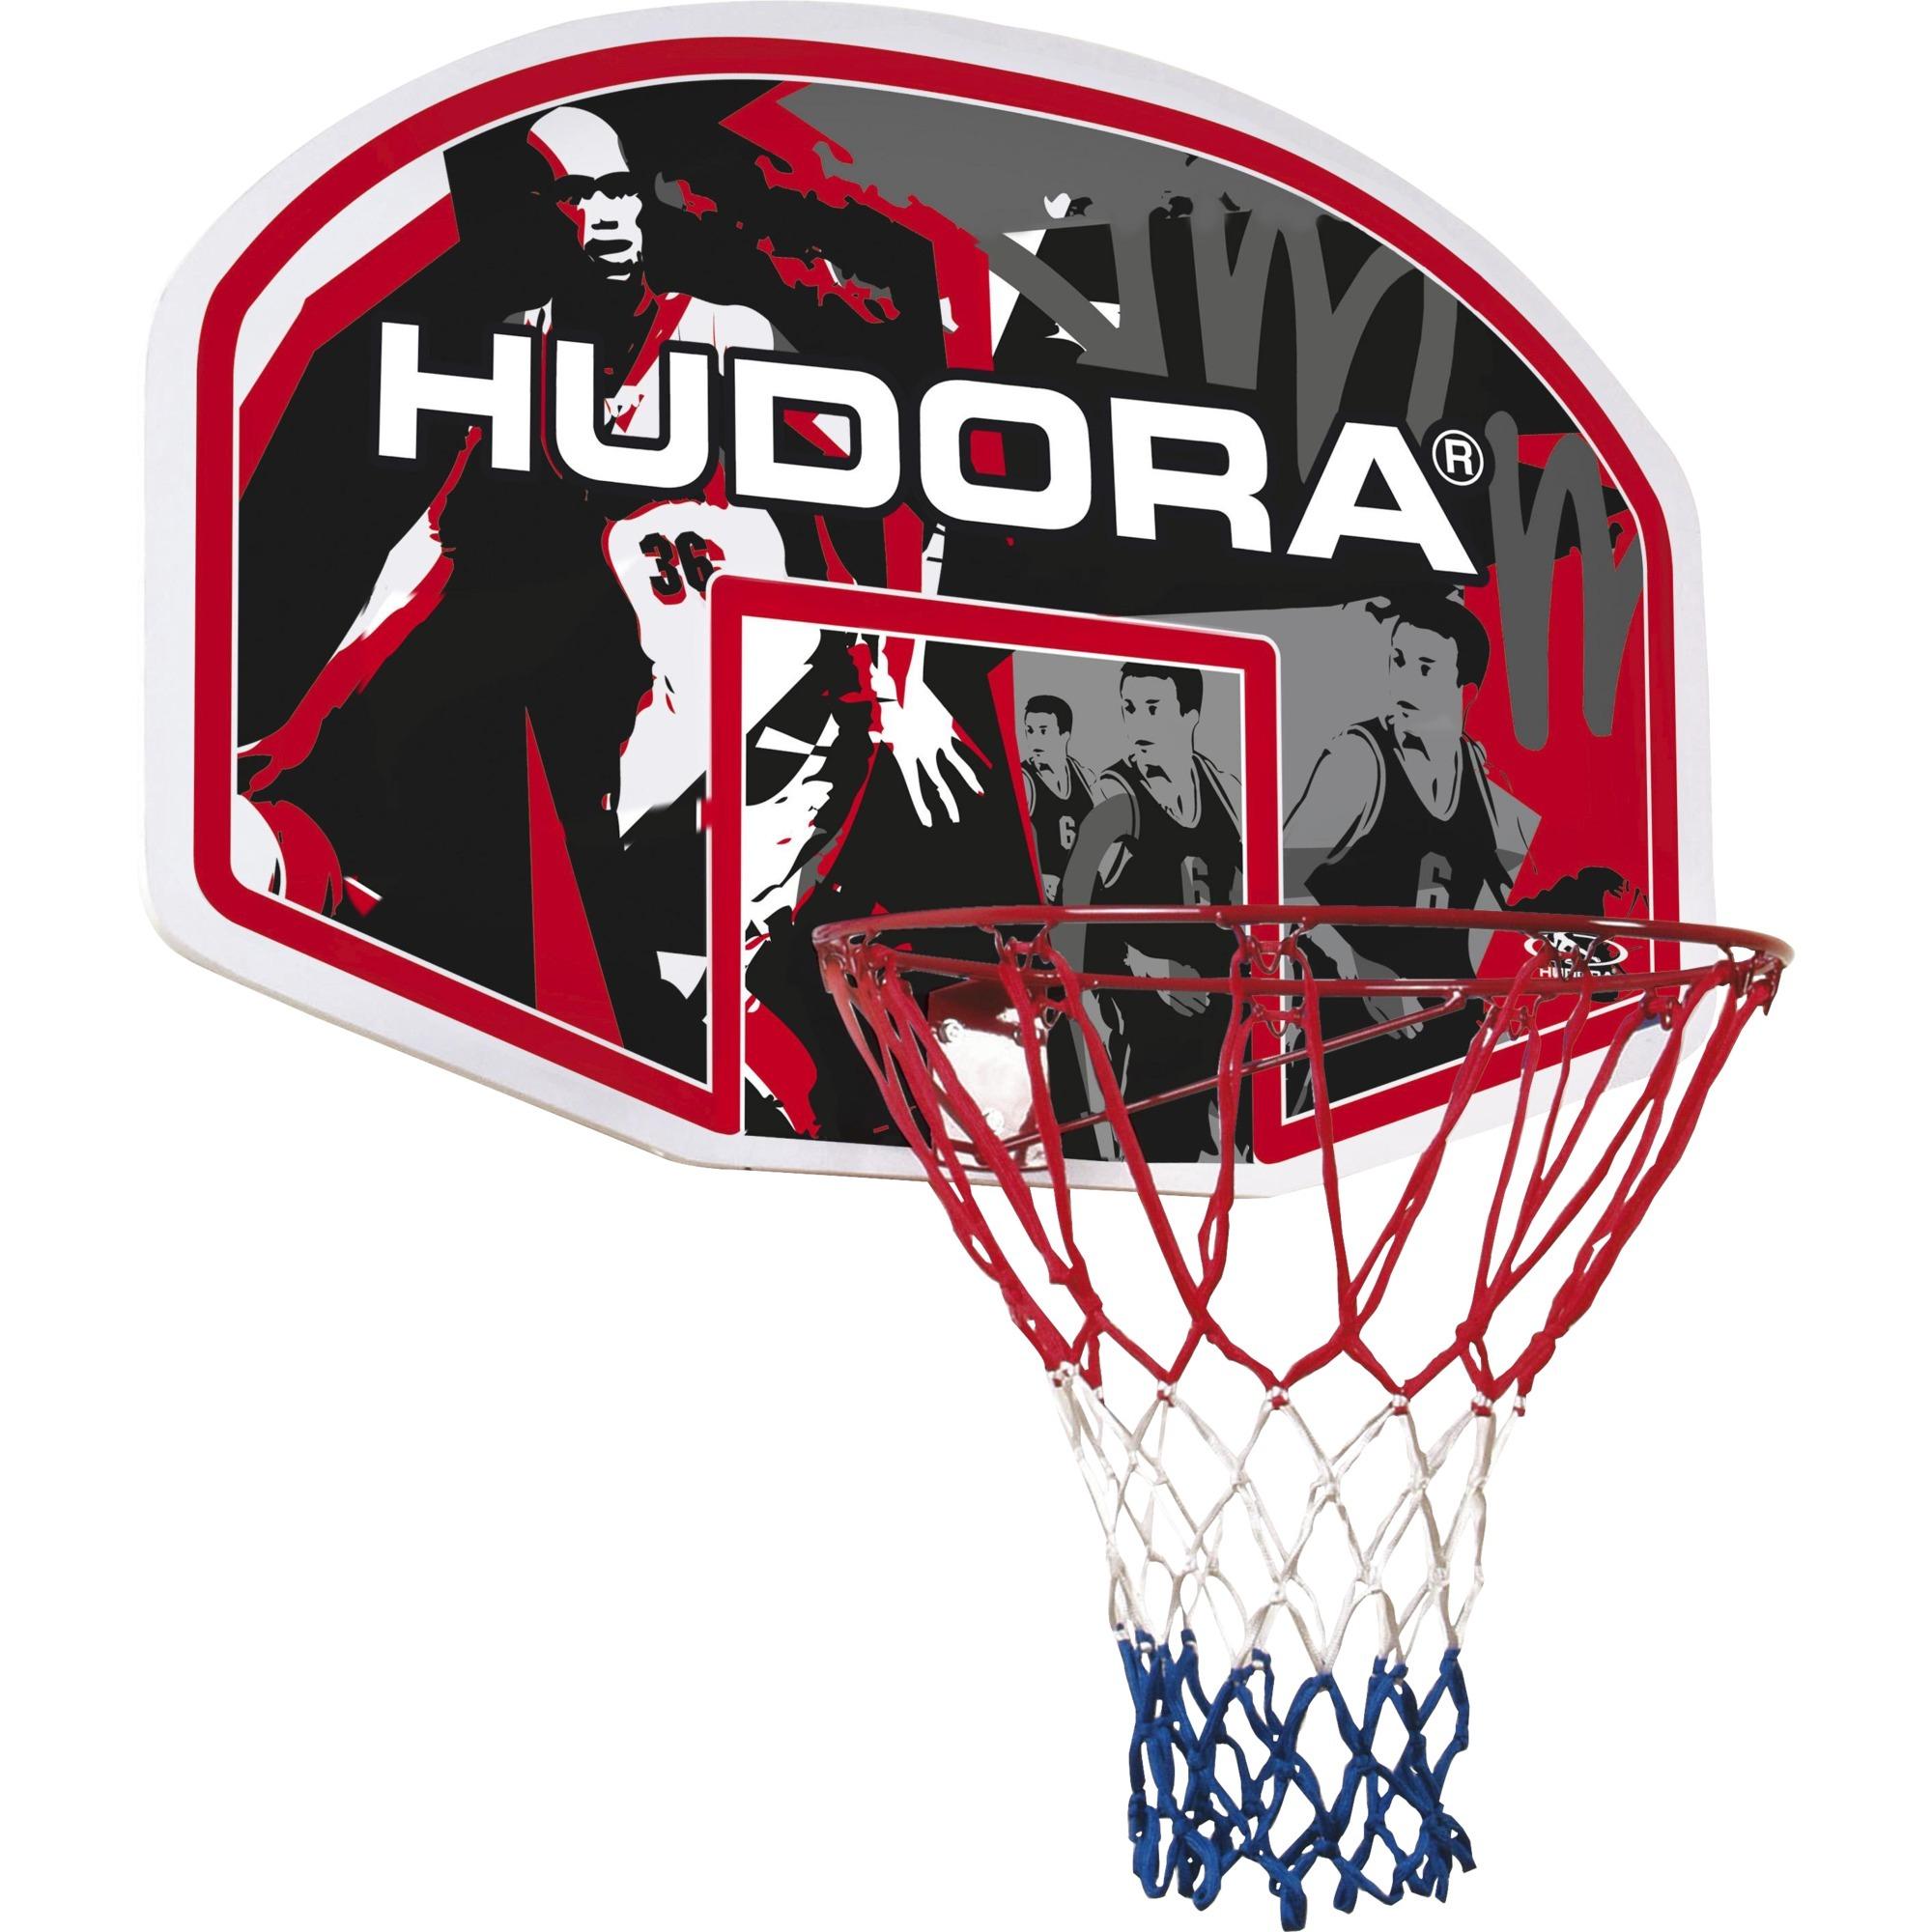 Jeu de Plein Air et Sport - Panier Basket In/Outdoor, Panier de basket